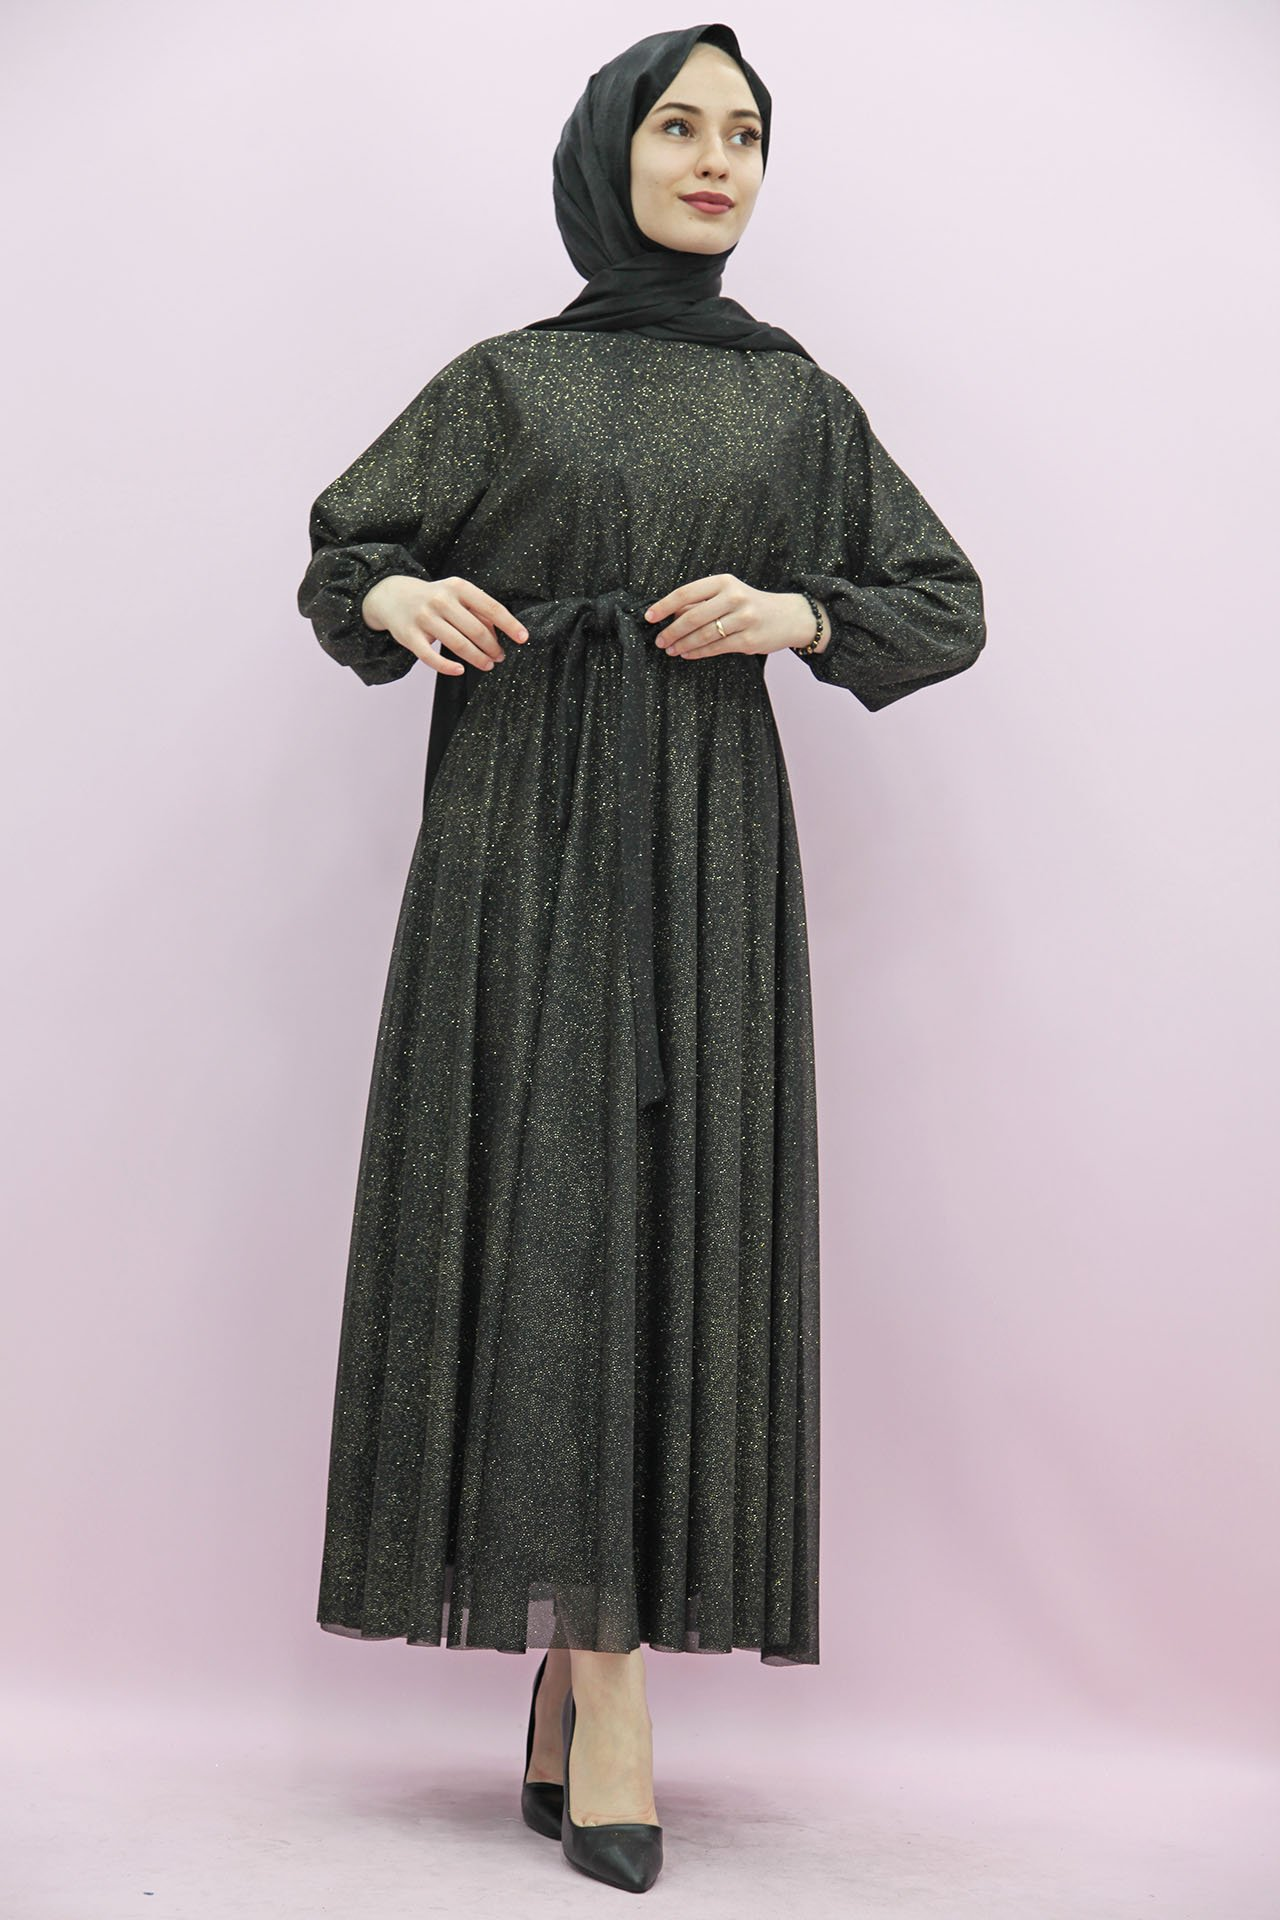 GİZAGİYİM - Simli Şifon Elbise Gold Simli